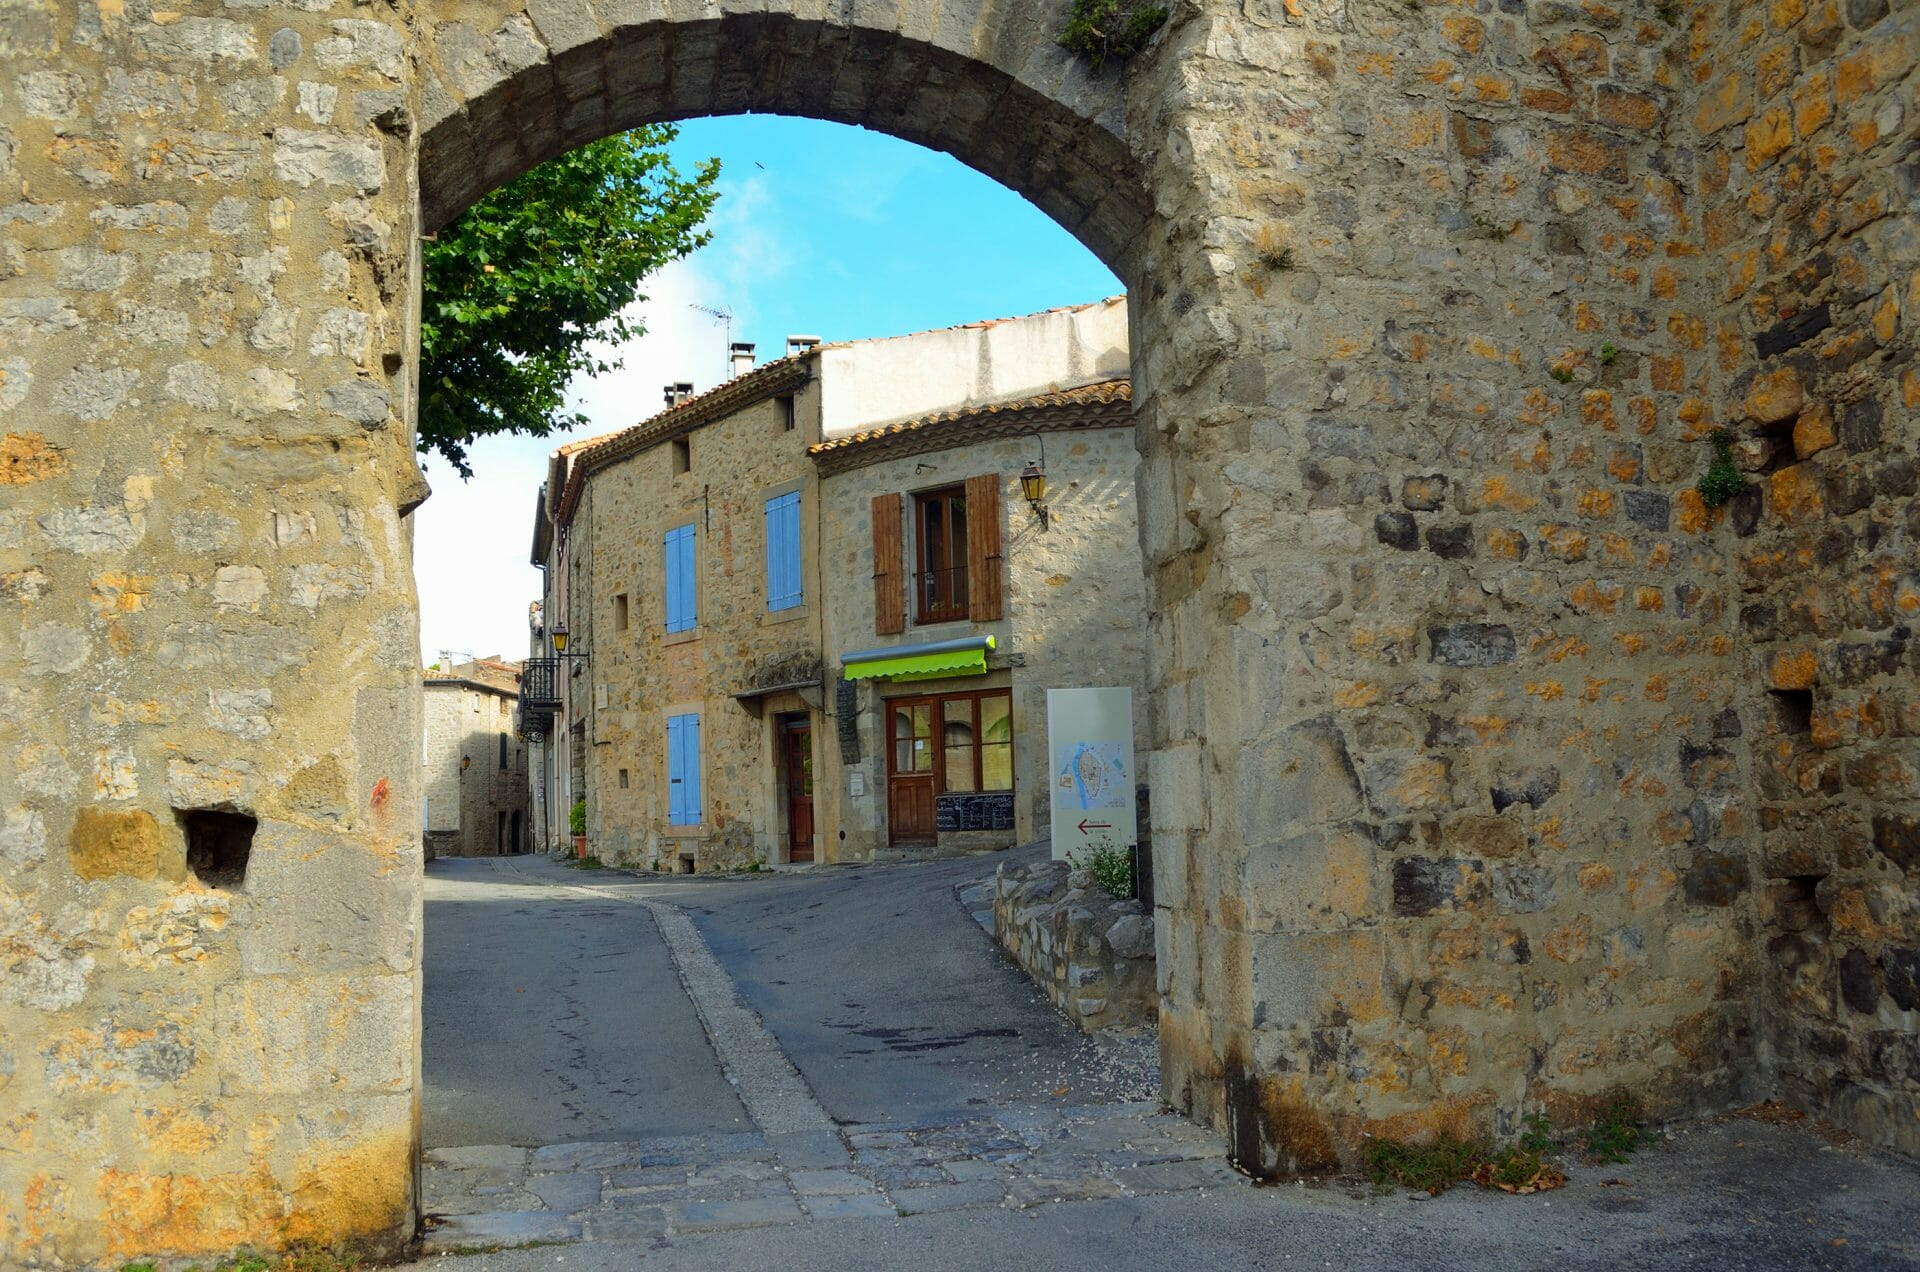 Lagrasse, Aude, Occitania, Francia.